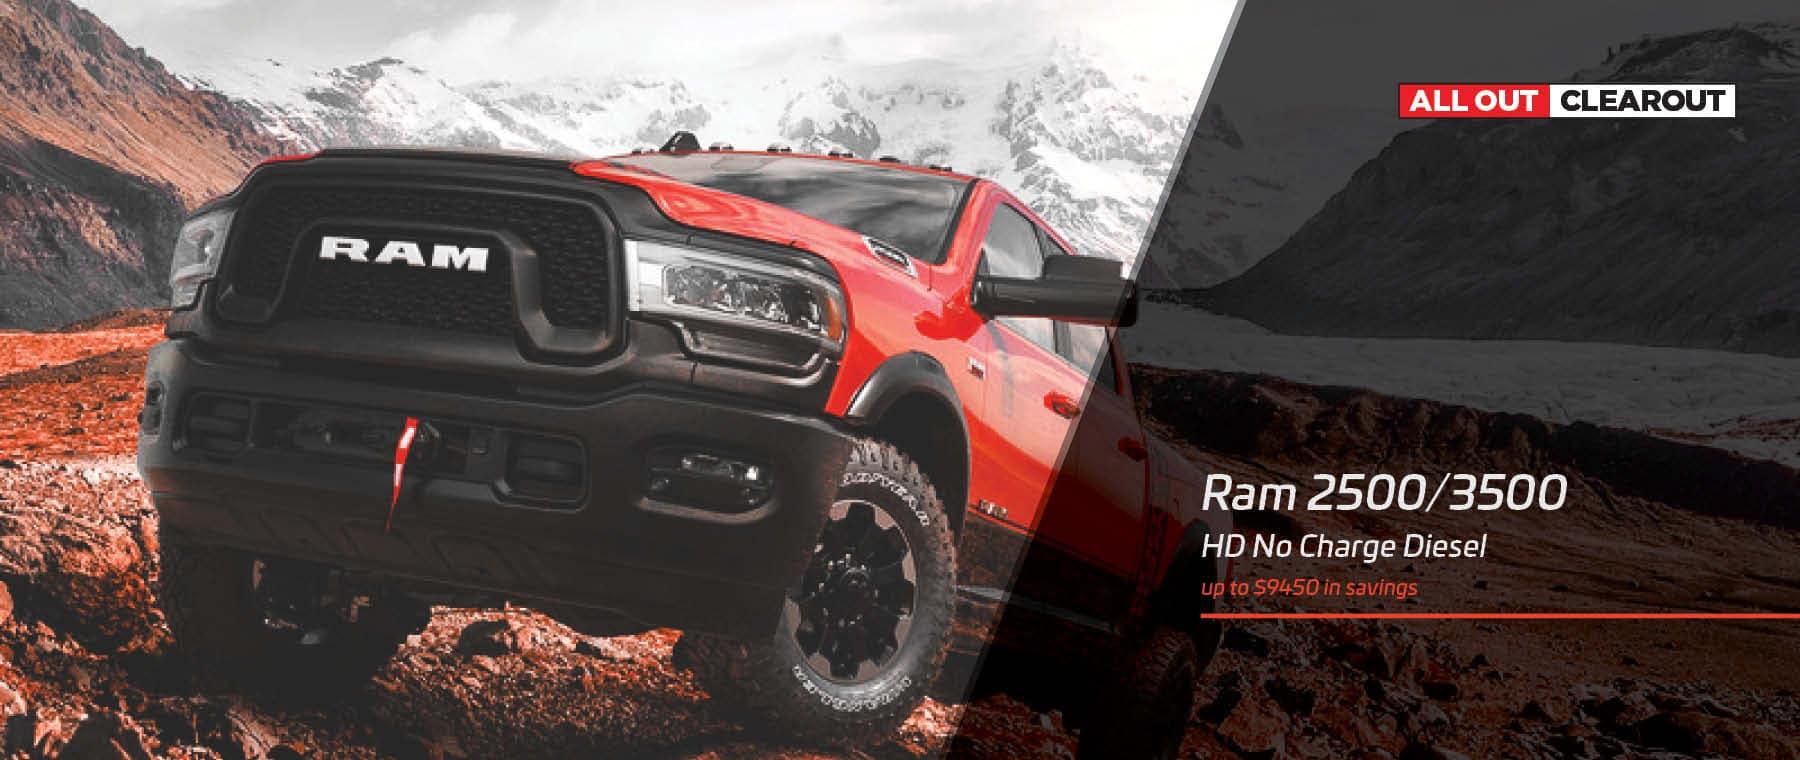 Ram Heavy Duty No Charge Diesel